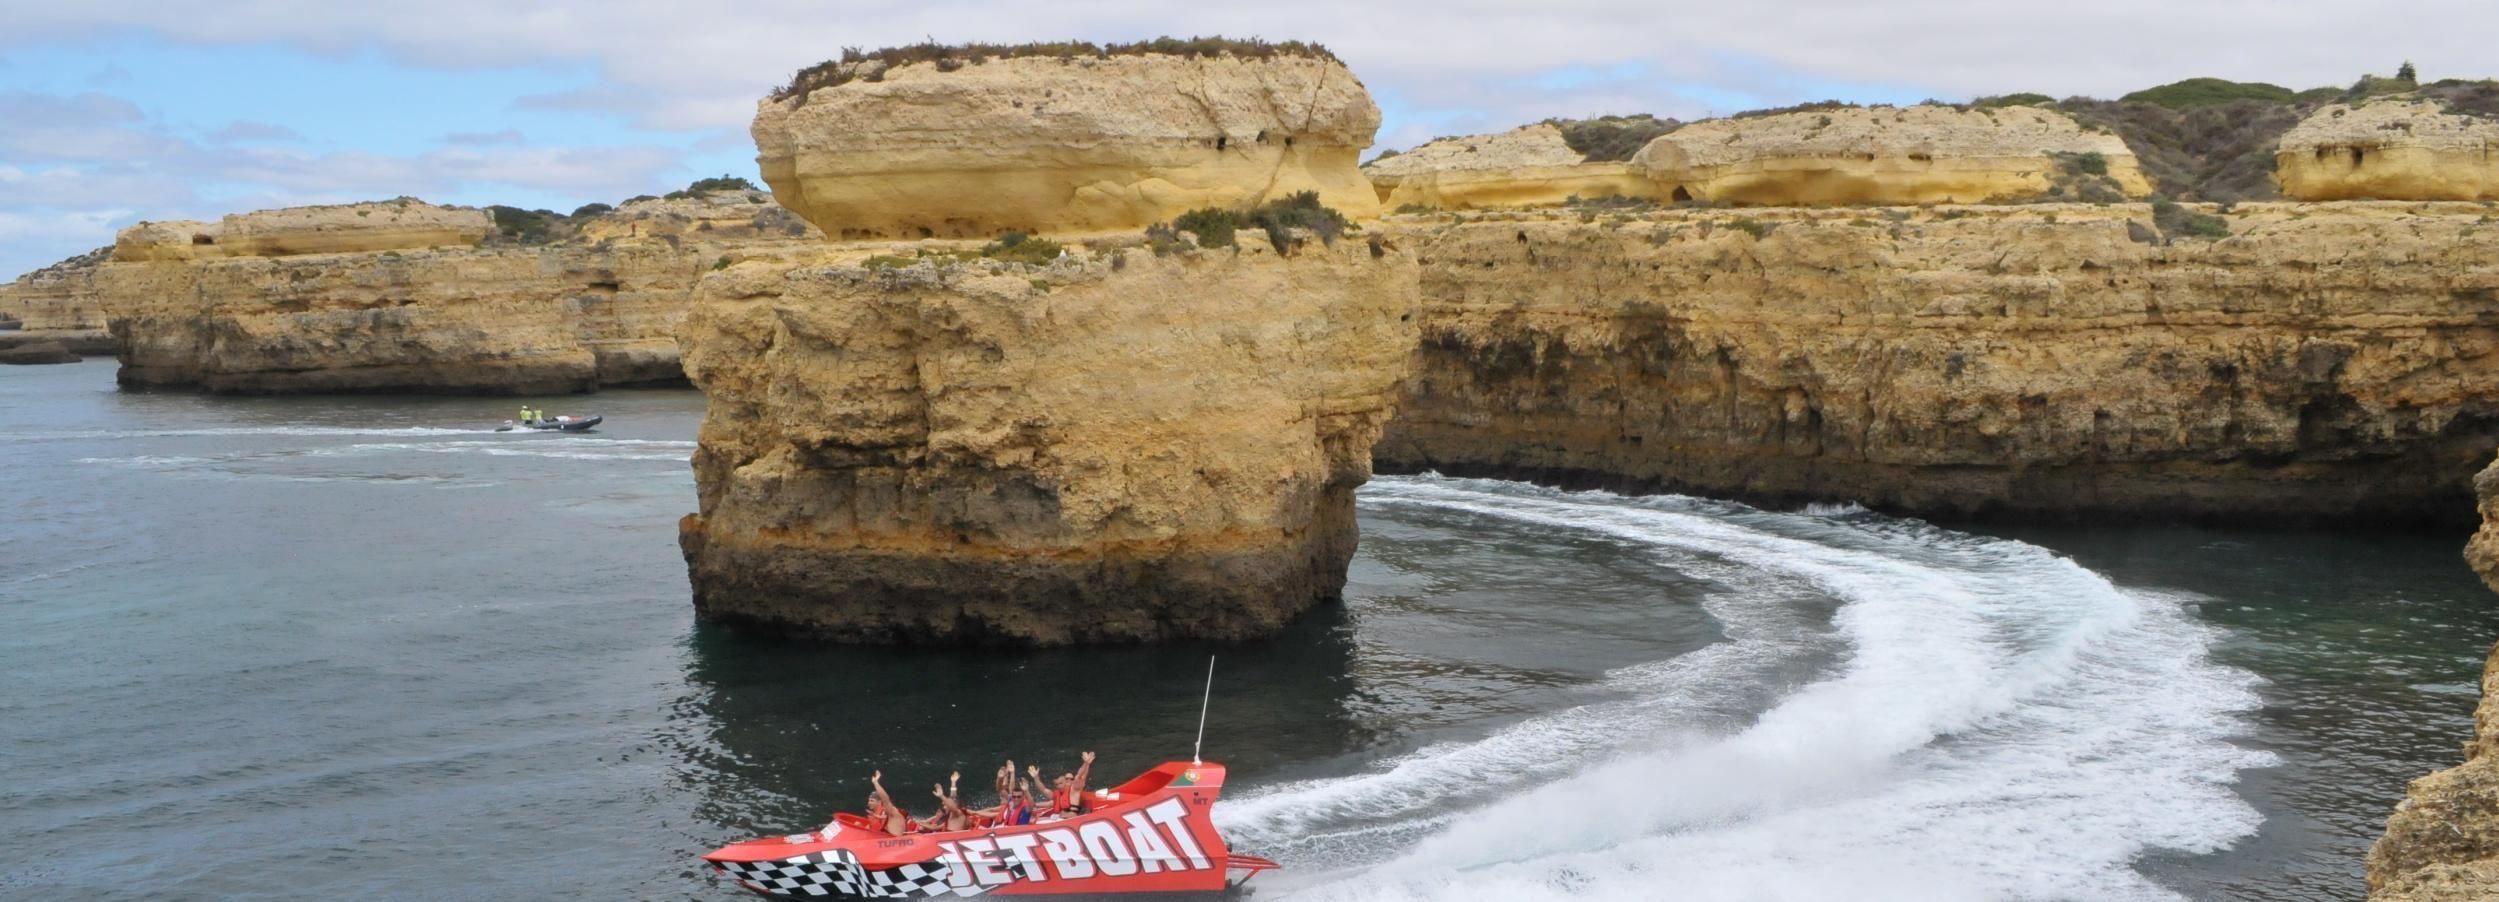 Algarve: Passeio Barco a Jato 30 Minutos